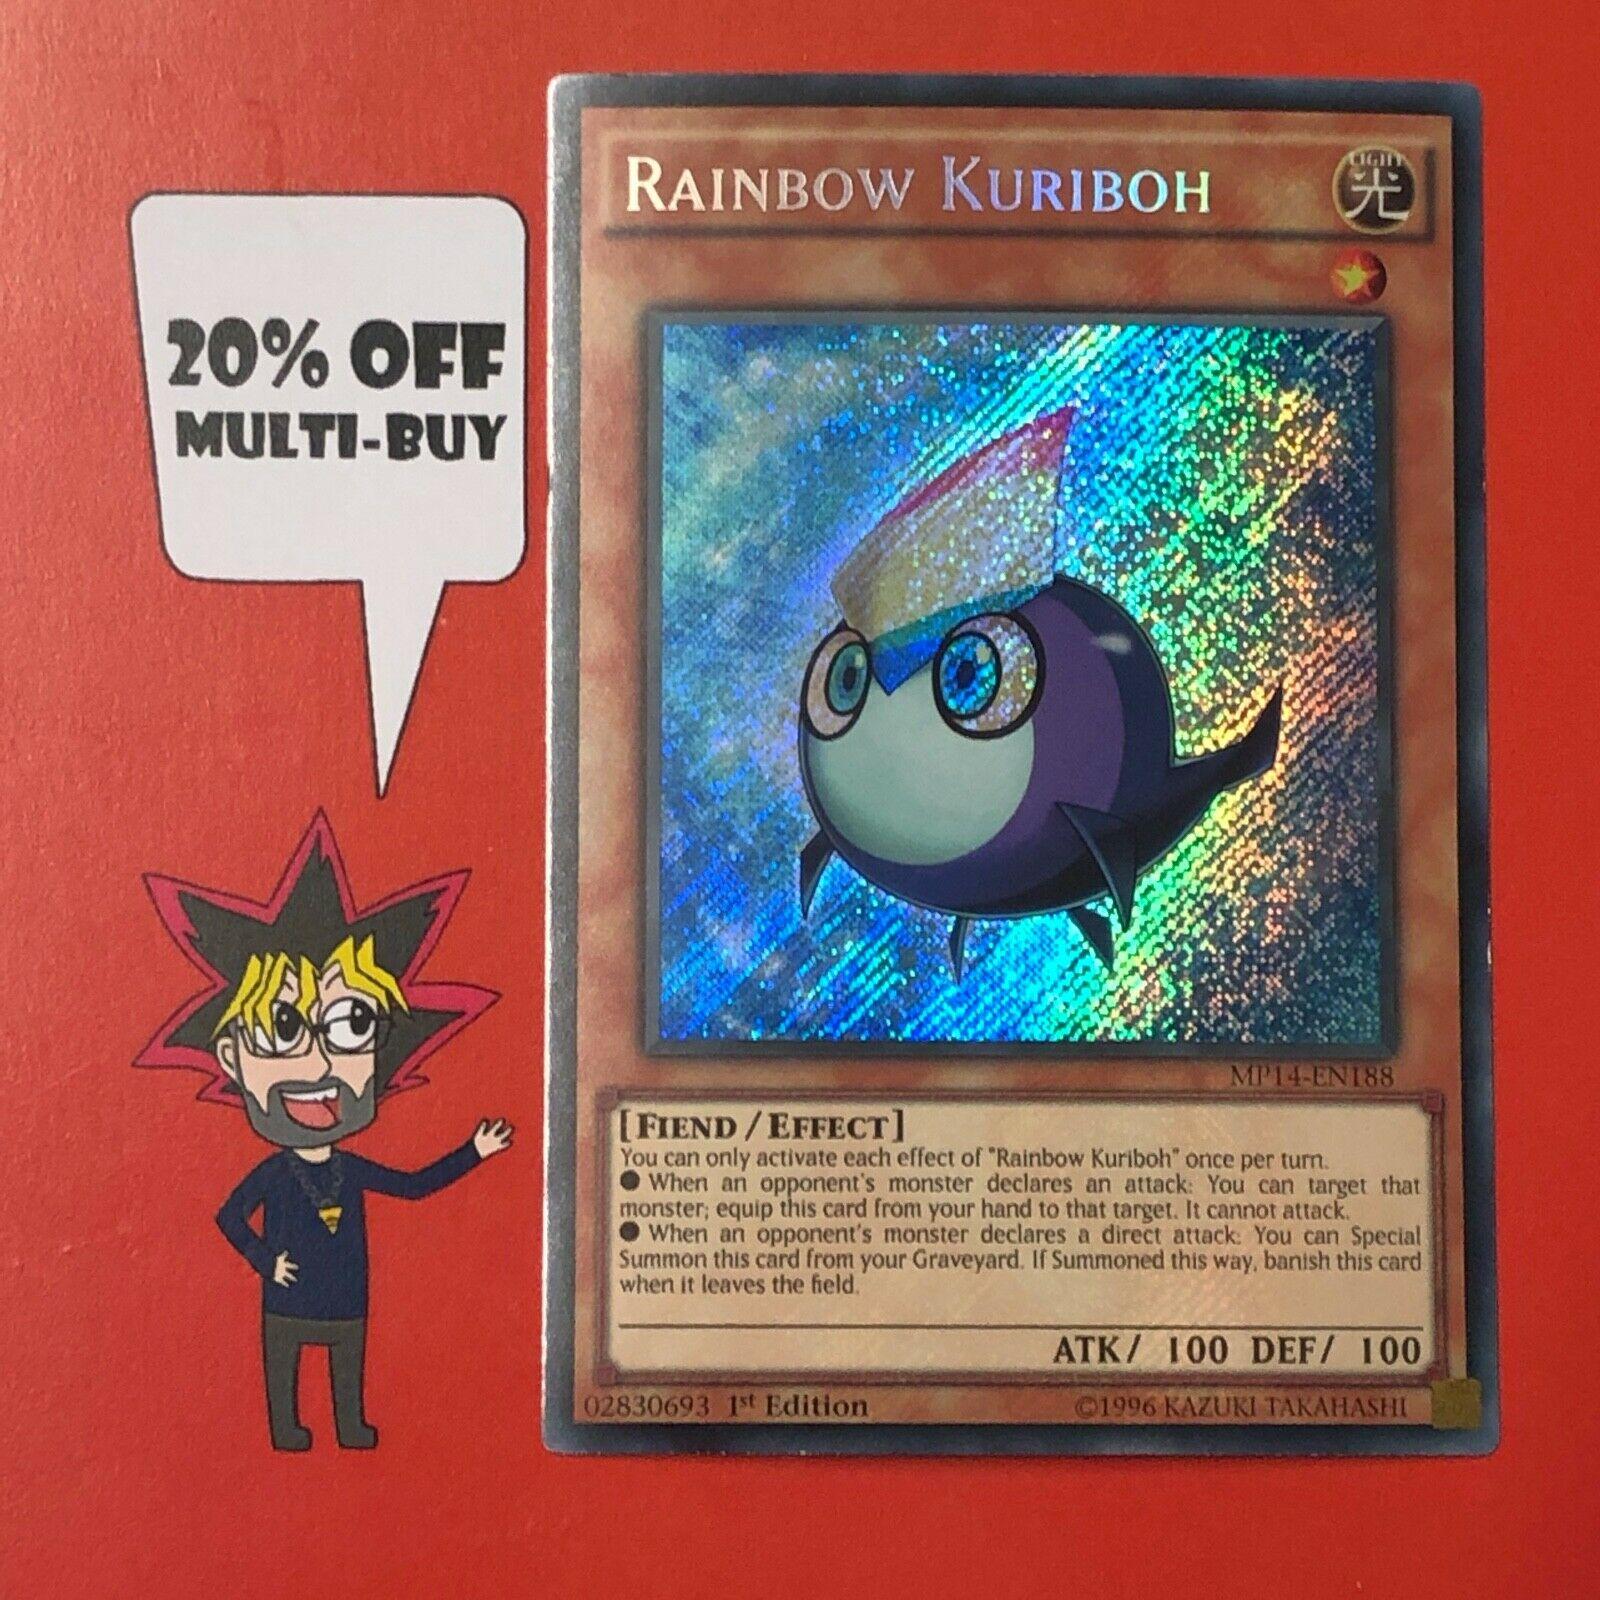 Secret Rare MP14-EN188 1st Edition Rainbow Kuriboh Yugioh